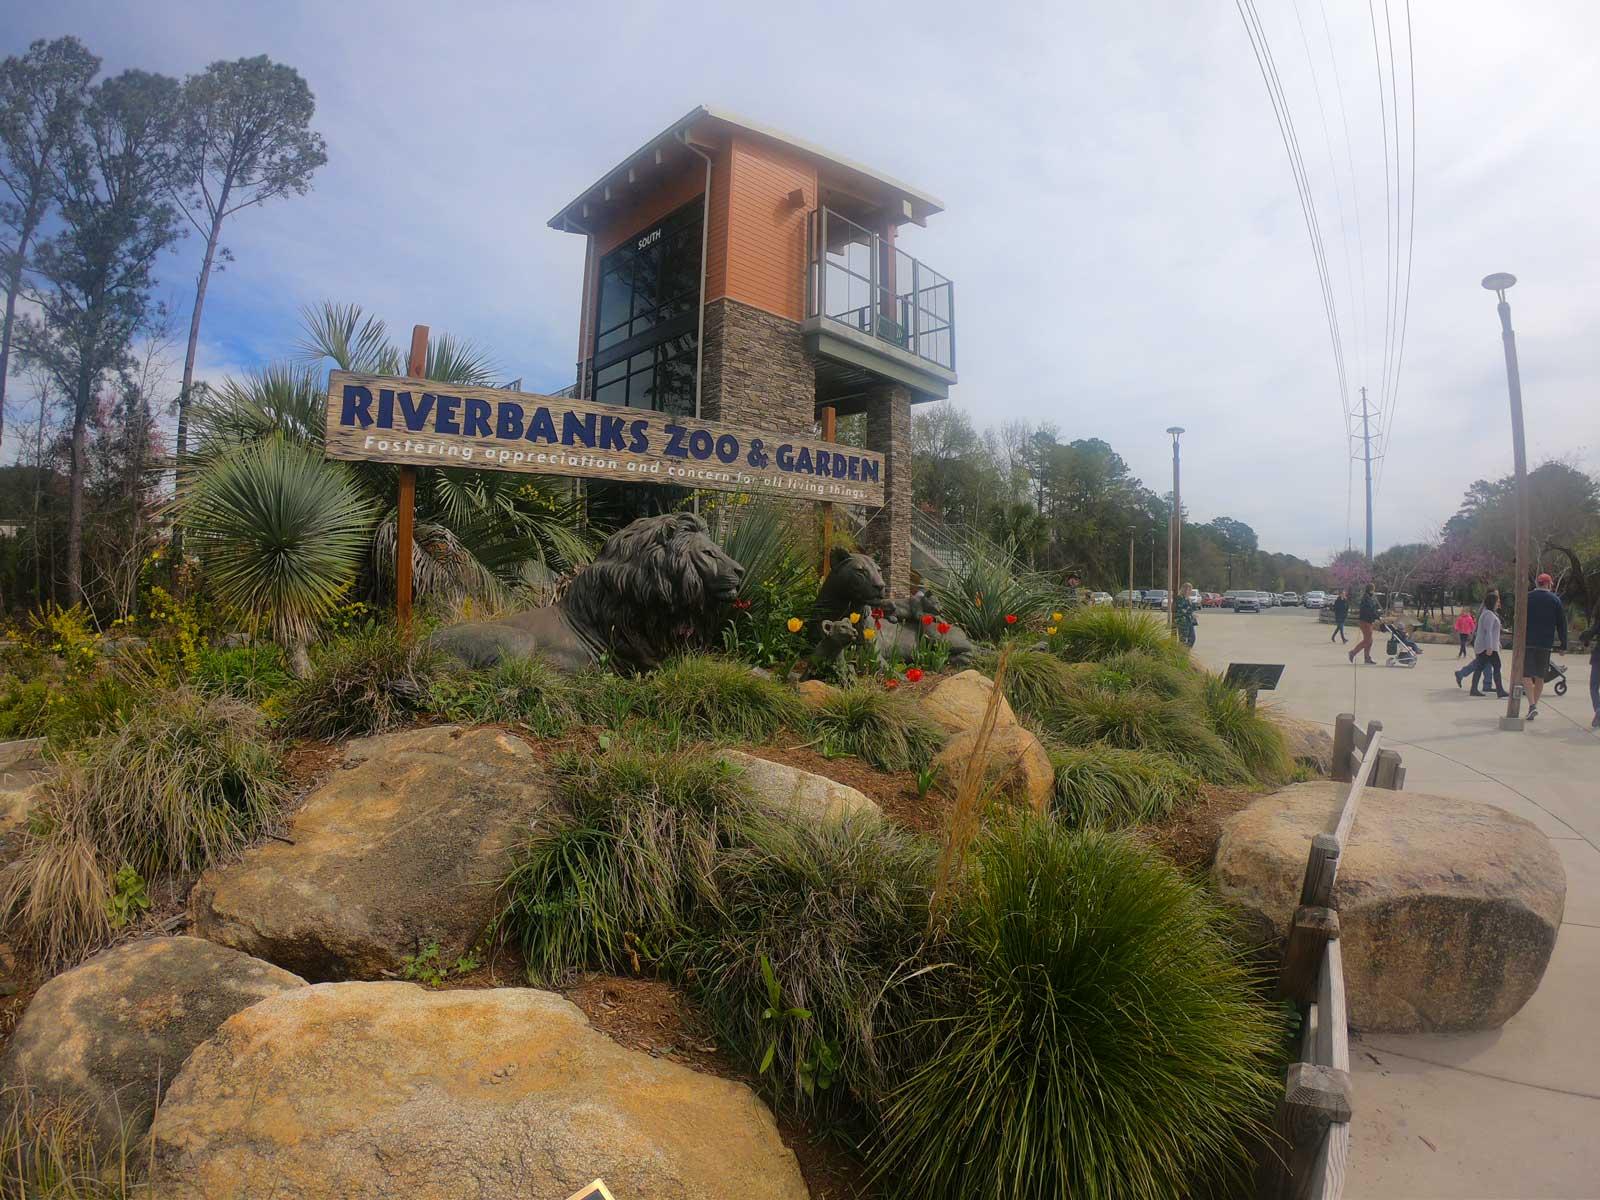 Front entrance to Riverbanks Zoo & Garden, Columbia, SC